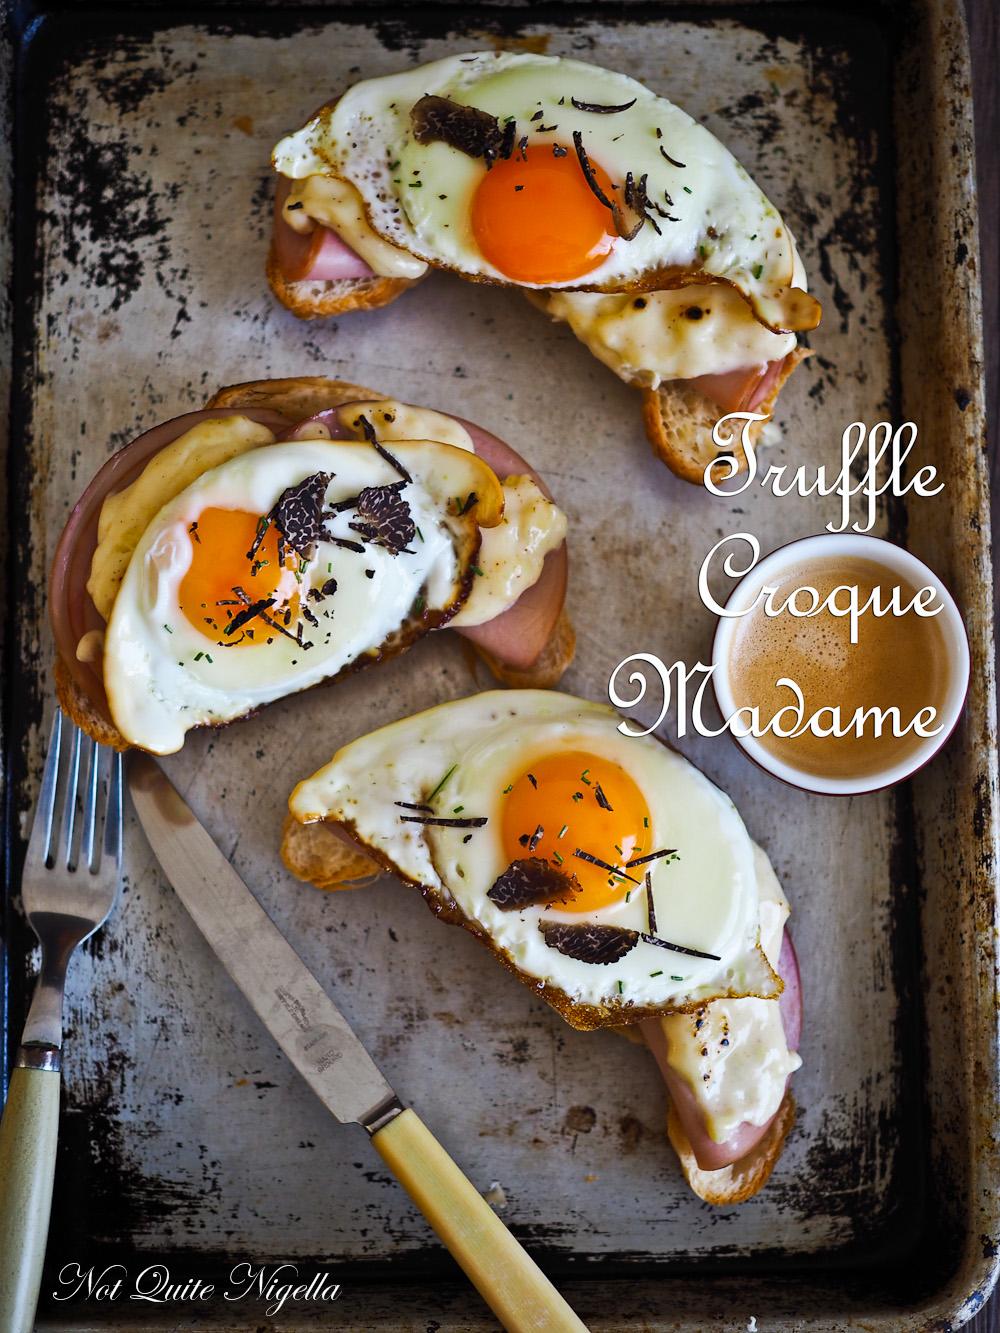 Truffle Croissant Madame